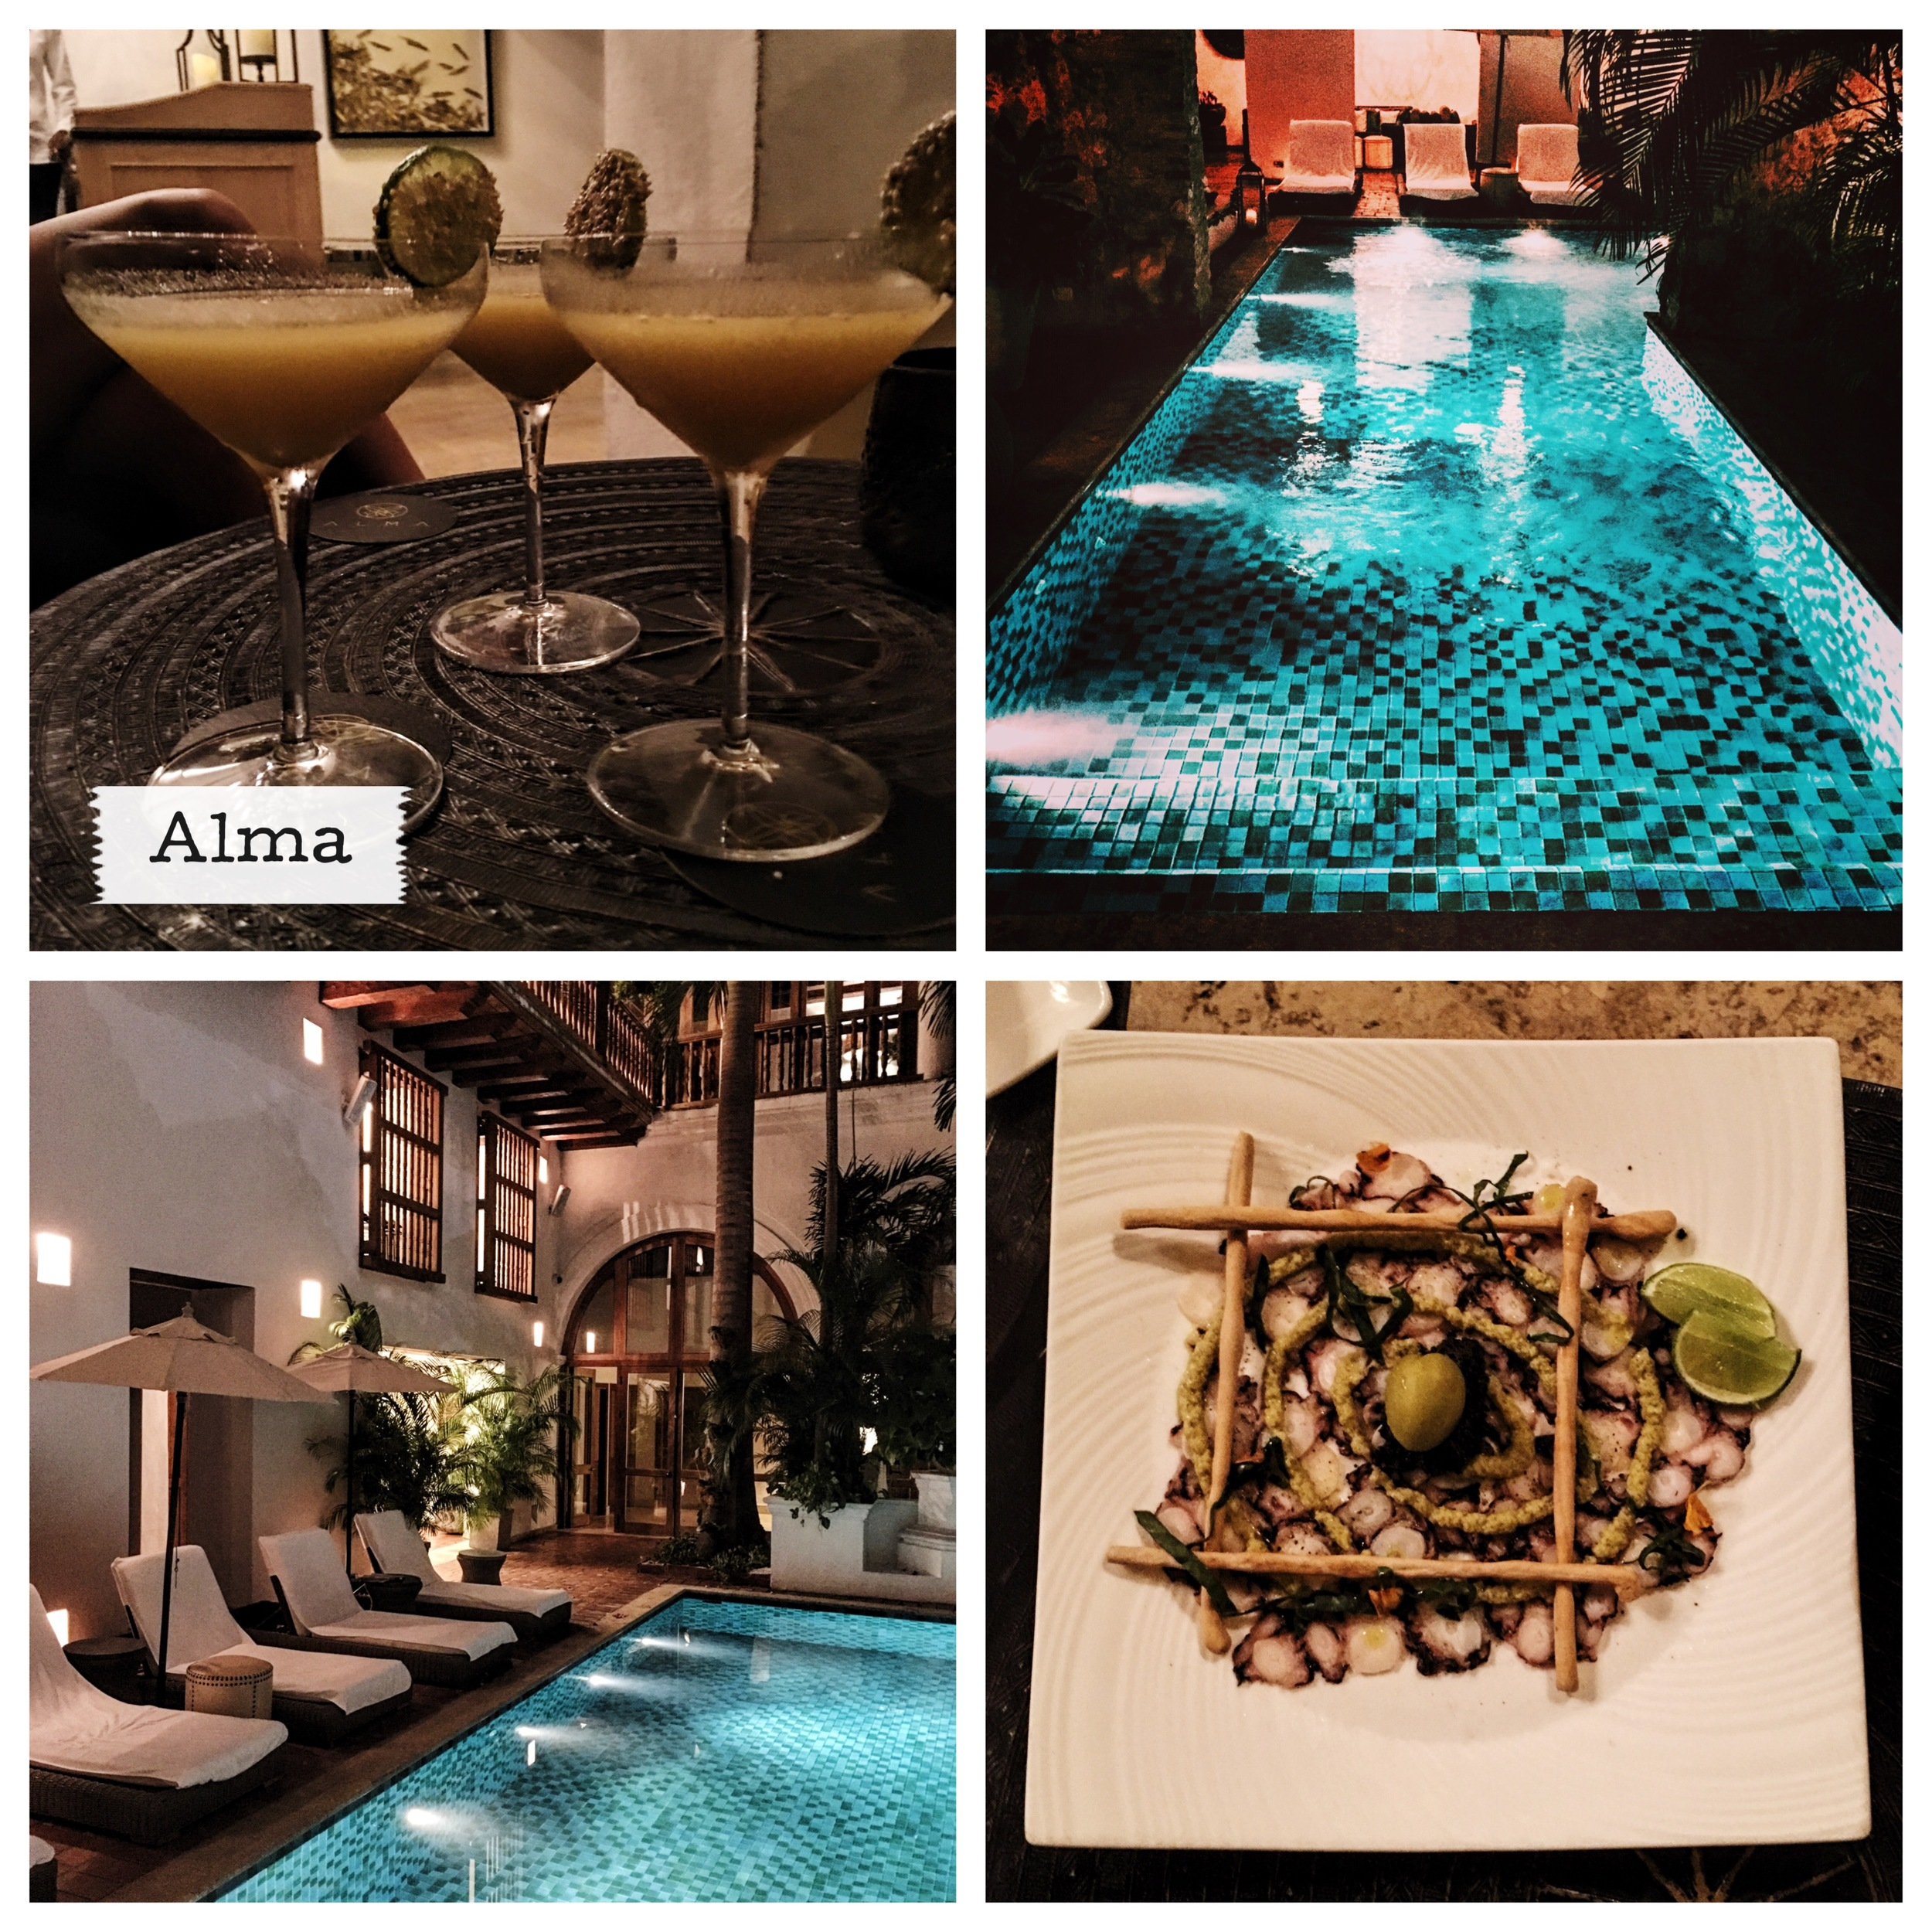 Alma @ Hotel Casa San Agustin